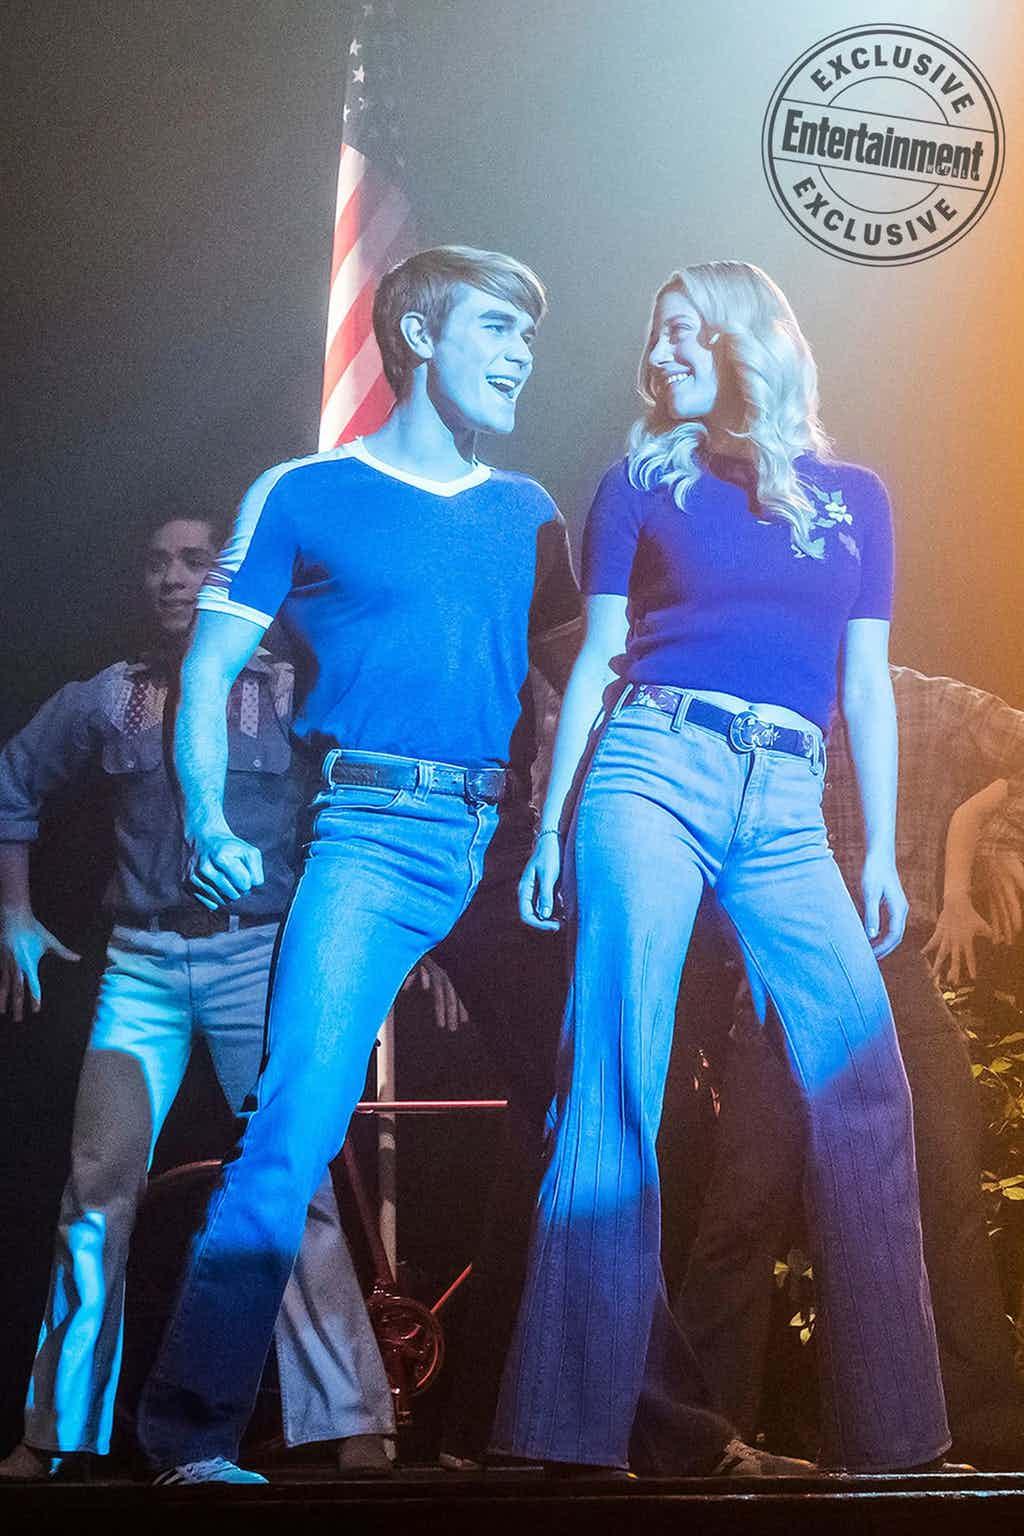 Riverdale-Archie-Andrews-Betty-Cooper-KJ-Apa-Lili-Reinhart-Edited